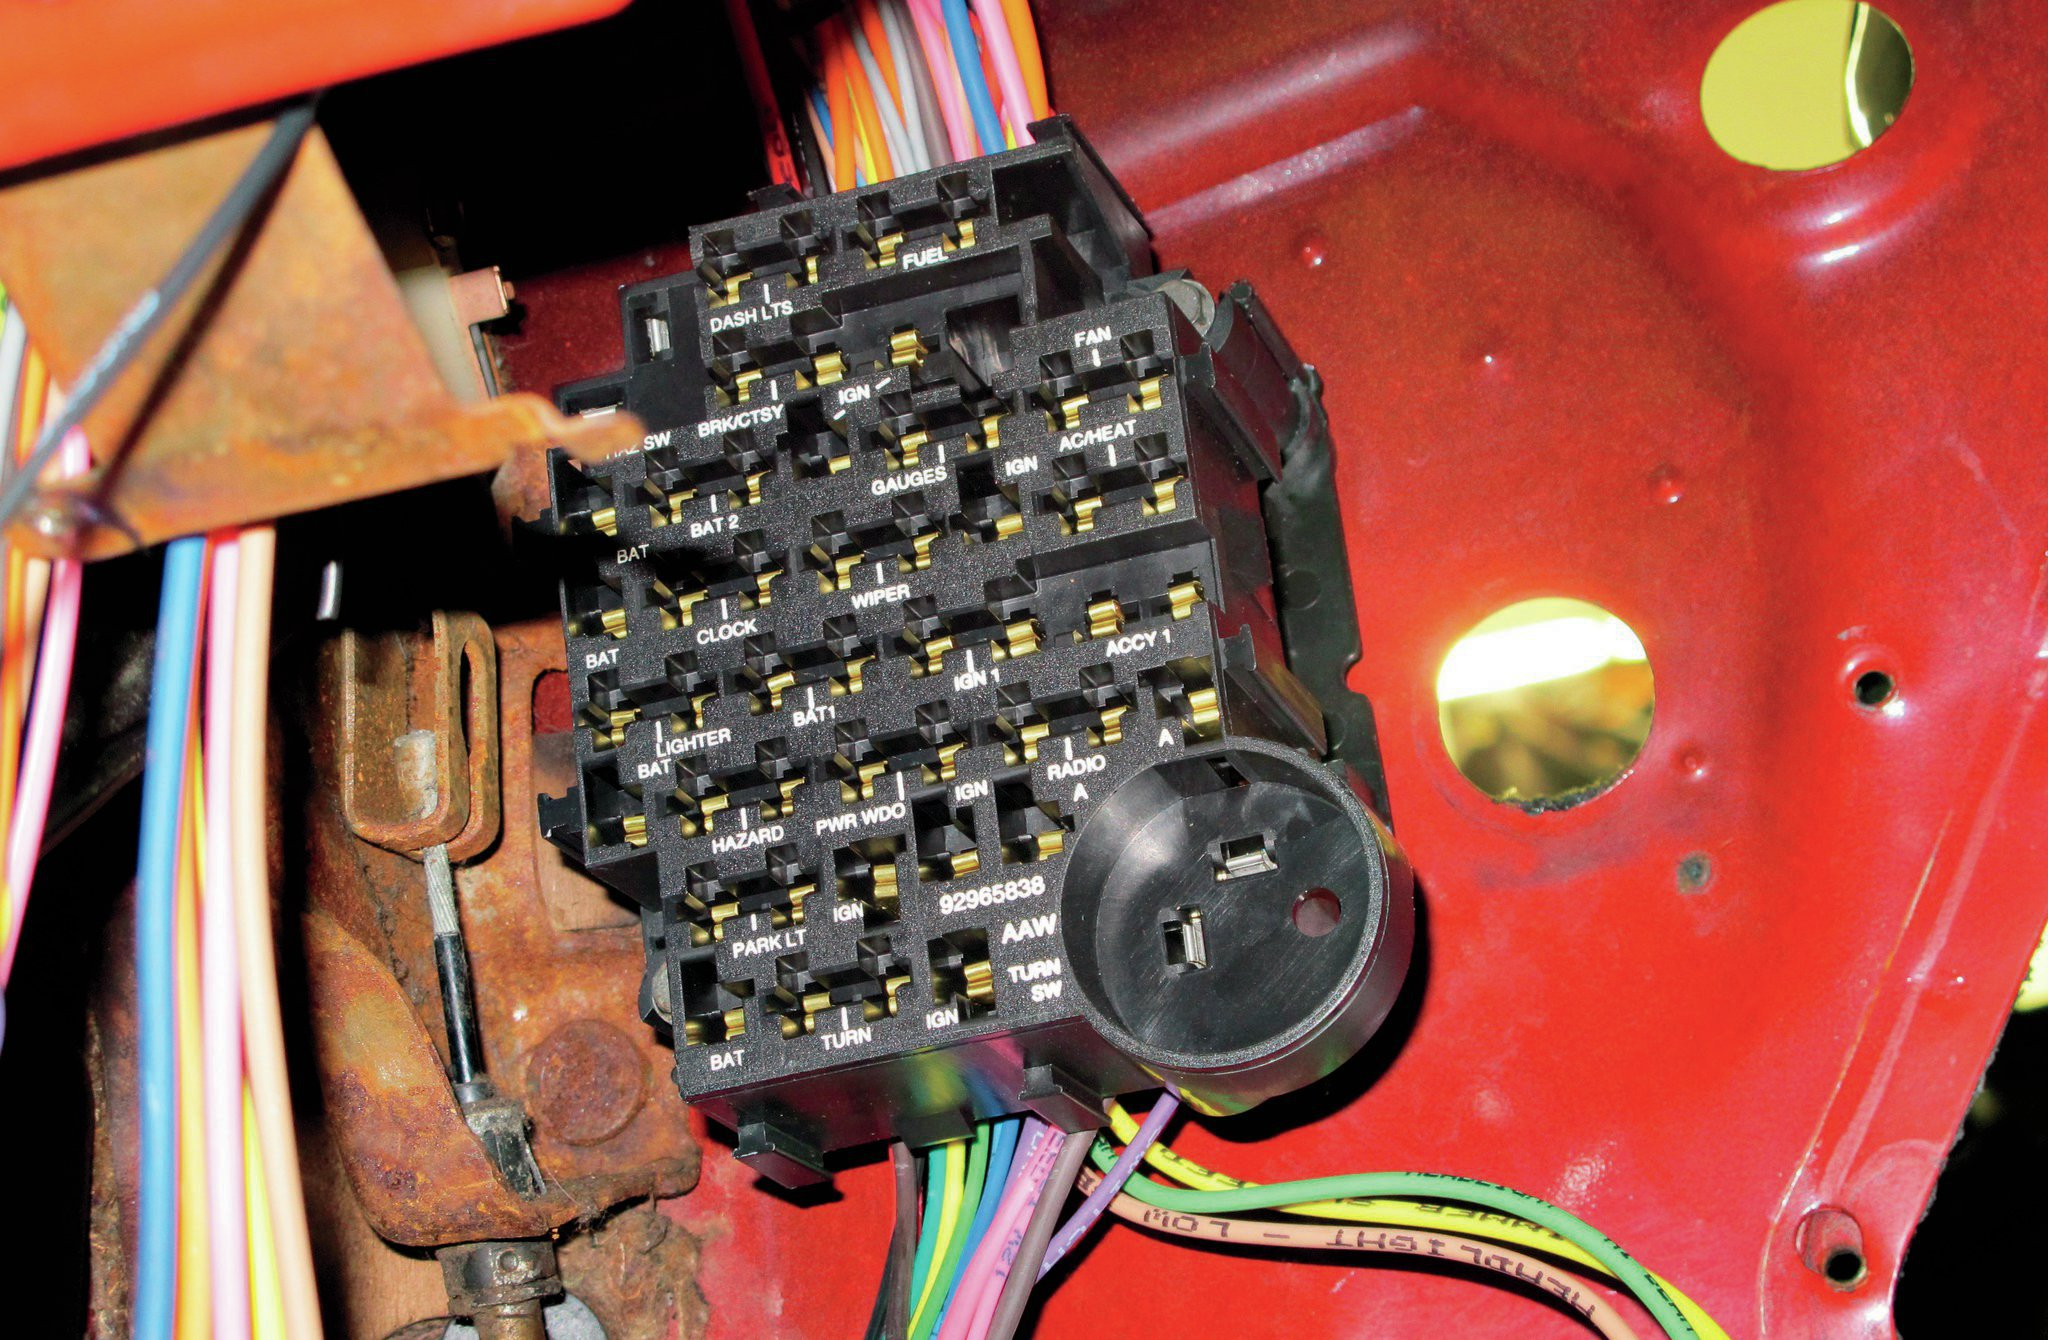 70 gmc truck fuse box wiring diagram technic1970 c10 fuse box wiring diagram technic70 gmc truck [ 2048 x 1340 Pixel ]